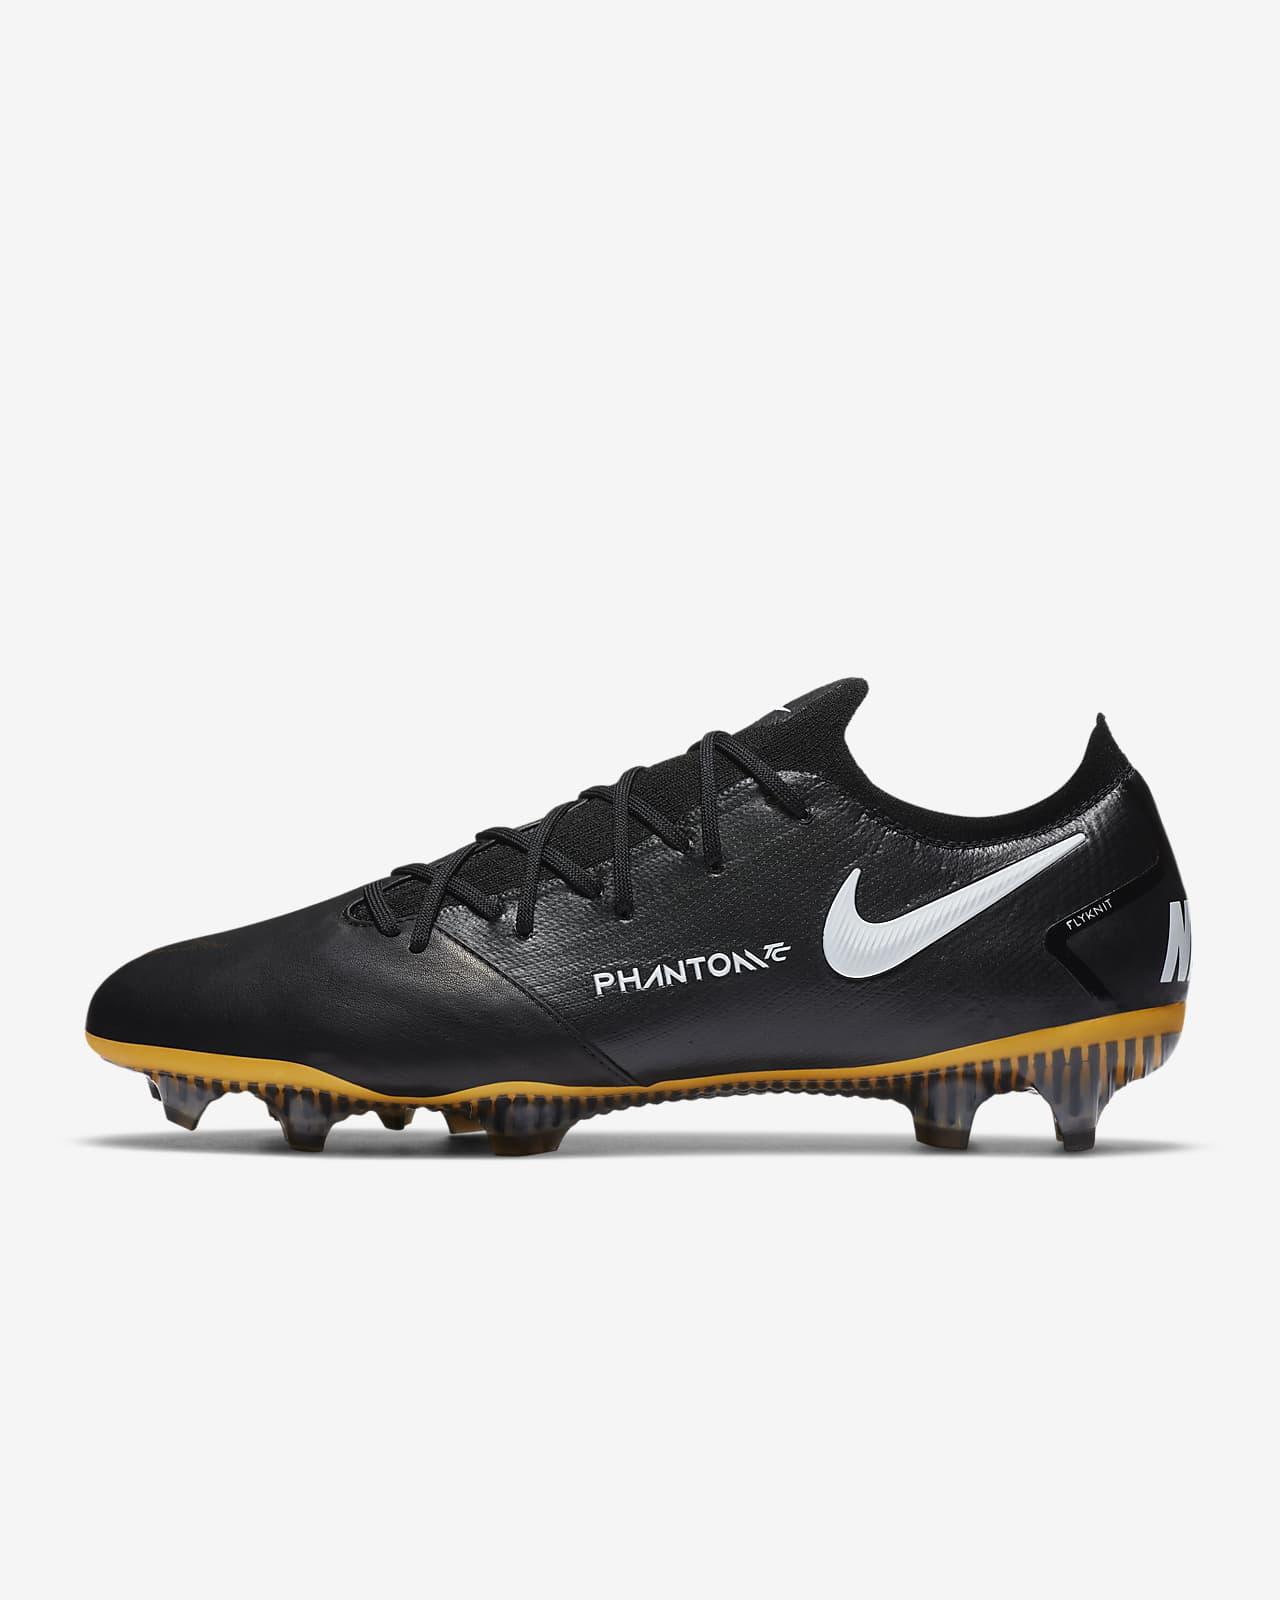 Chaussure de football à crampons pour terrain sec Nike Phantom GT Elite Tech Craft FG